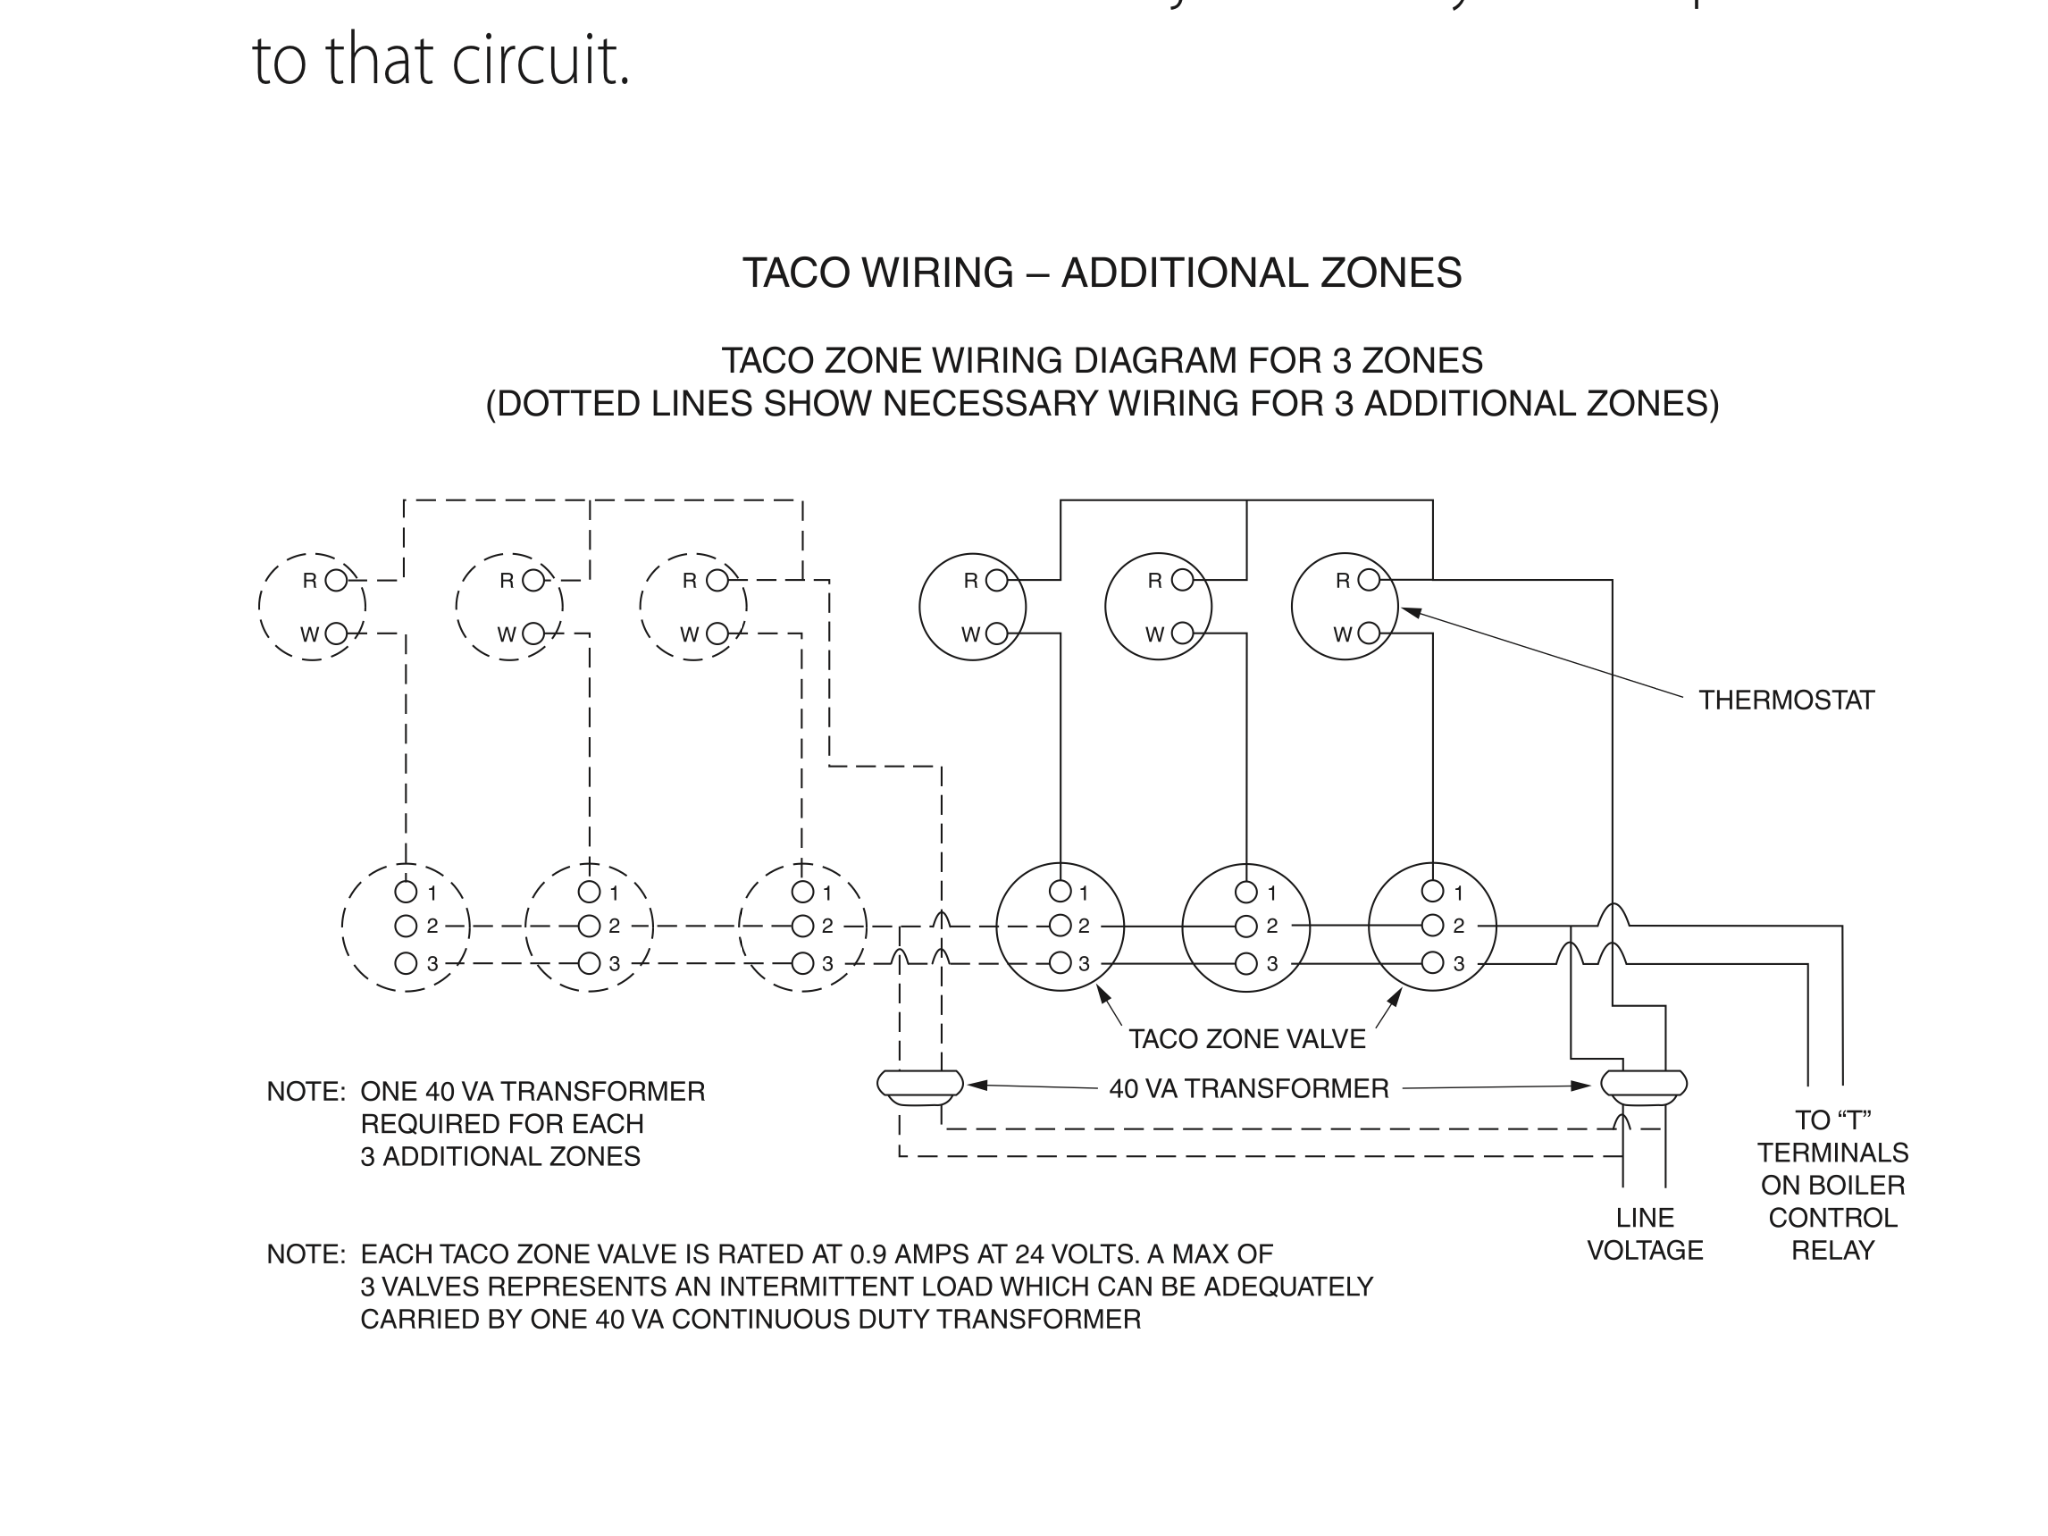 Taco Sentry Zone Valve Wiring DiagramPinterest